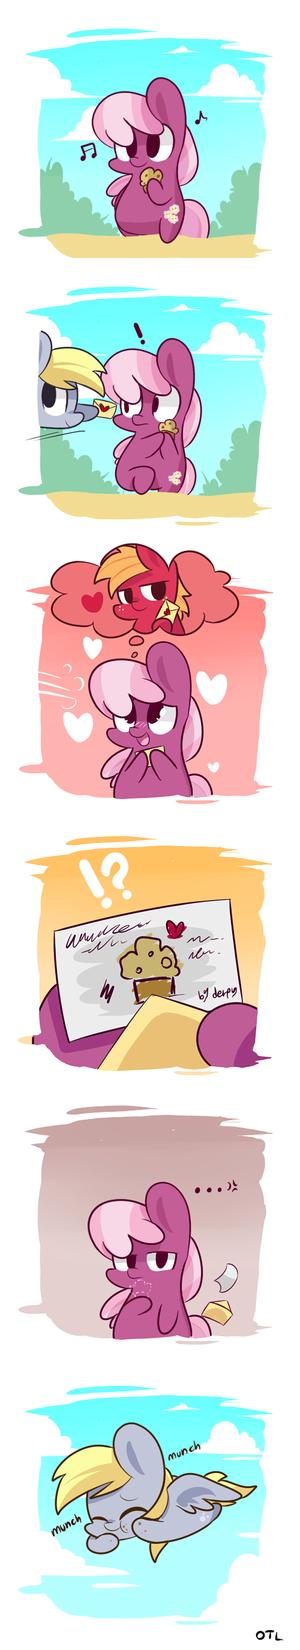 secret 愛 letter